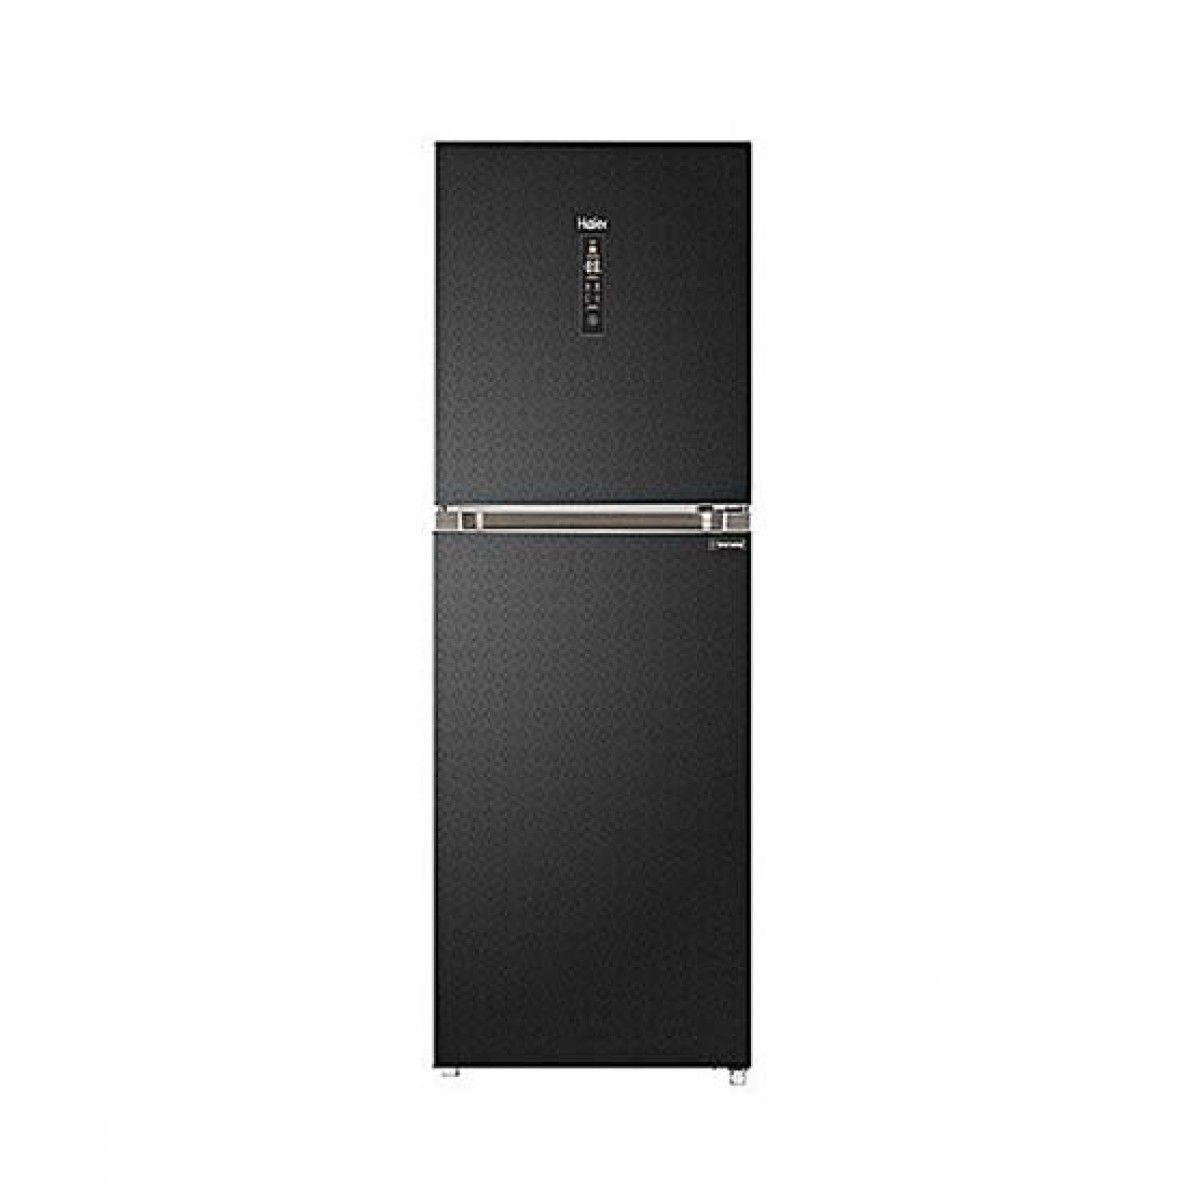 Haier HRF-438TDB 14 cu ft Refrigerator